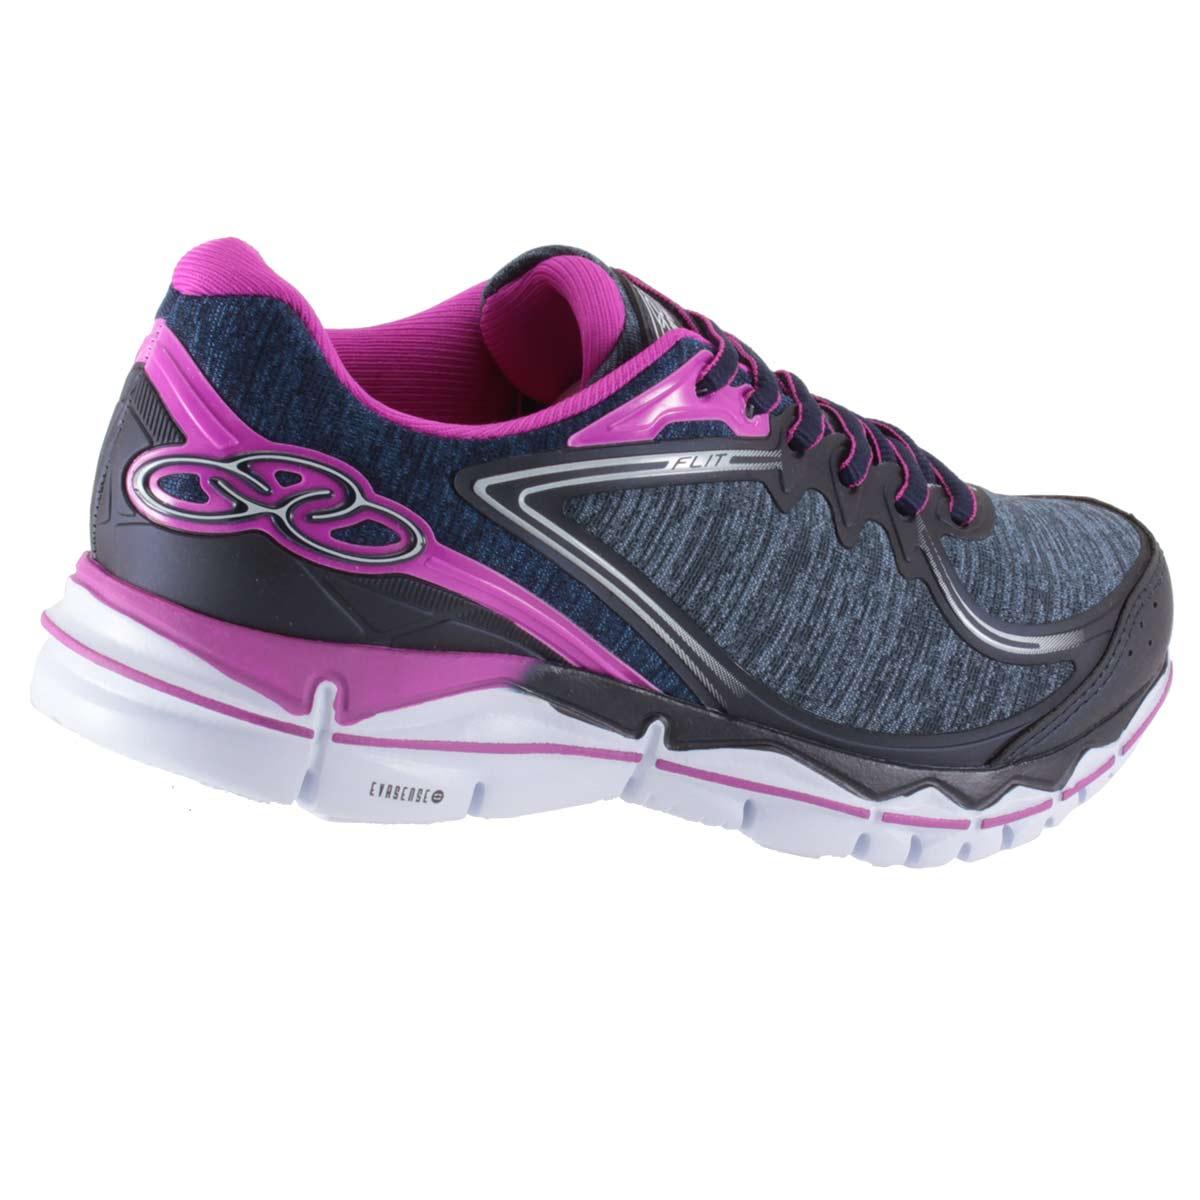 Tênis Olympikus Flit Feminino Caminhada Corrida Running 259